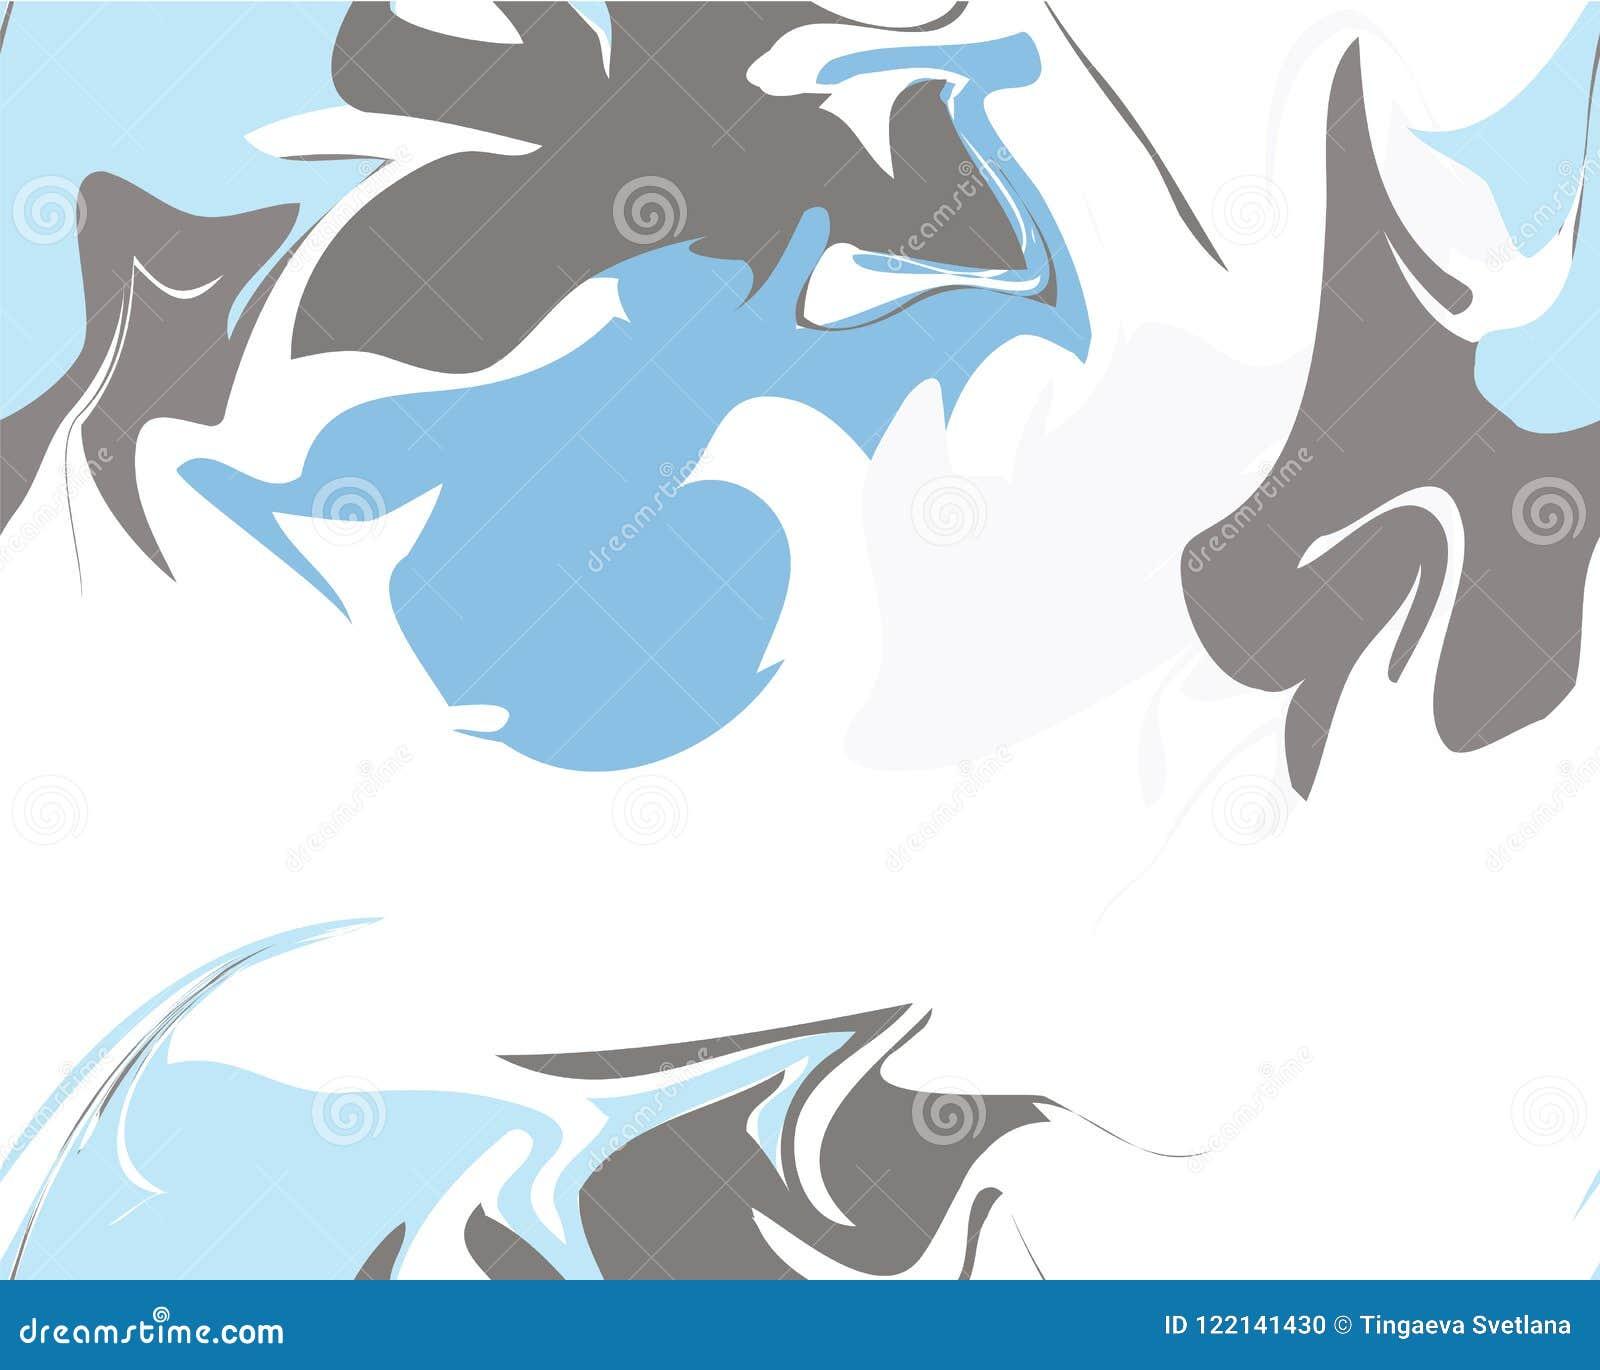 Marble Texture Seamless Pattern Stock Vector - Illustration of ...